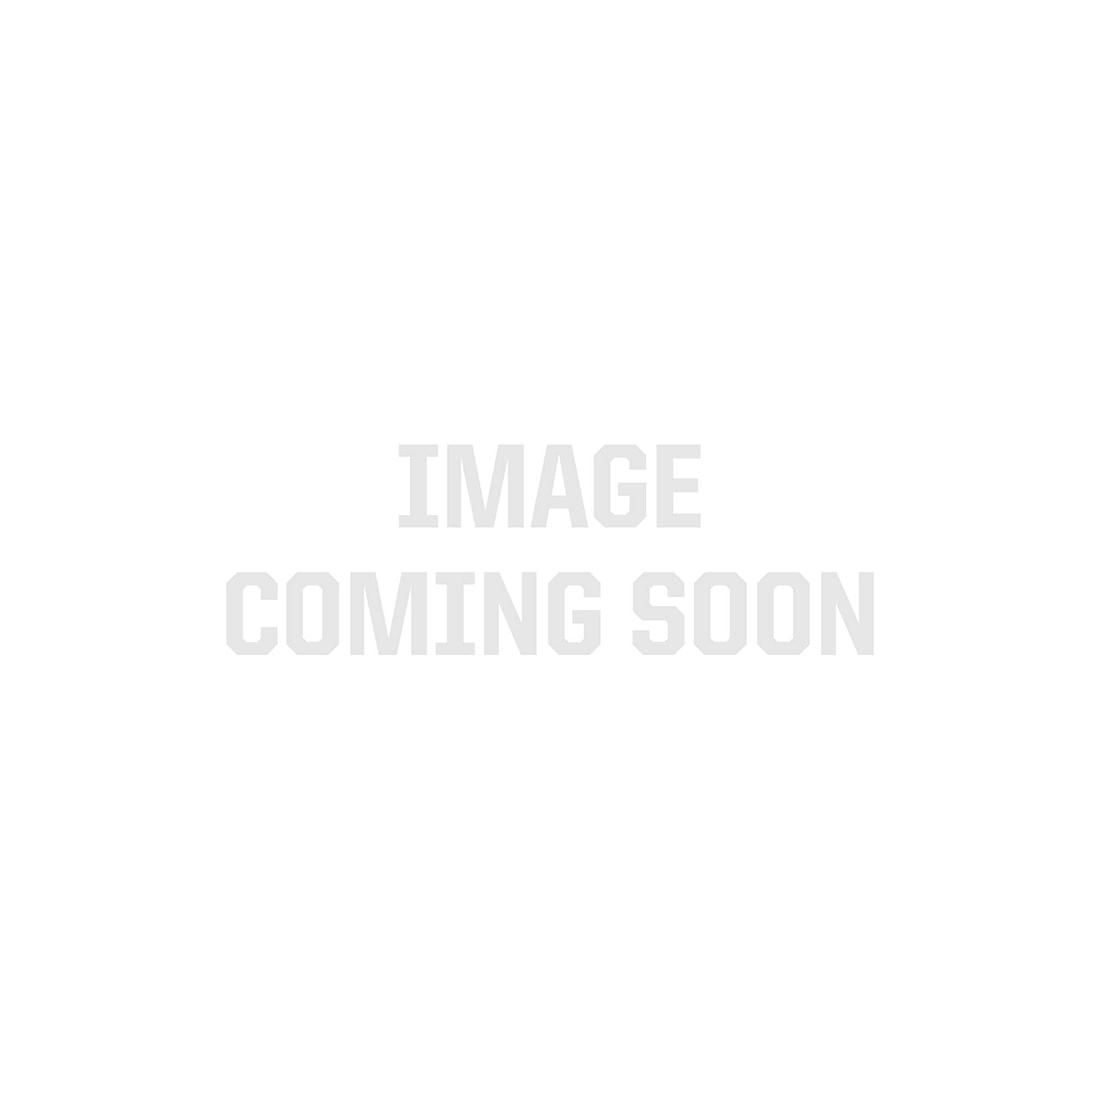 S14 Frosted Glass Dimmable LED Light Bulb, E26 (Medium) Base, 1.4 watt (Green)